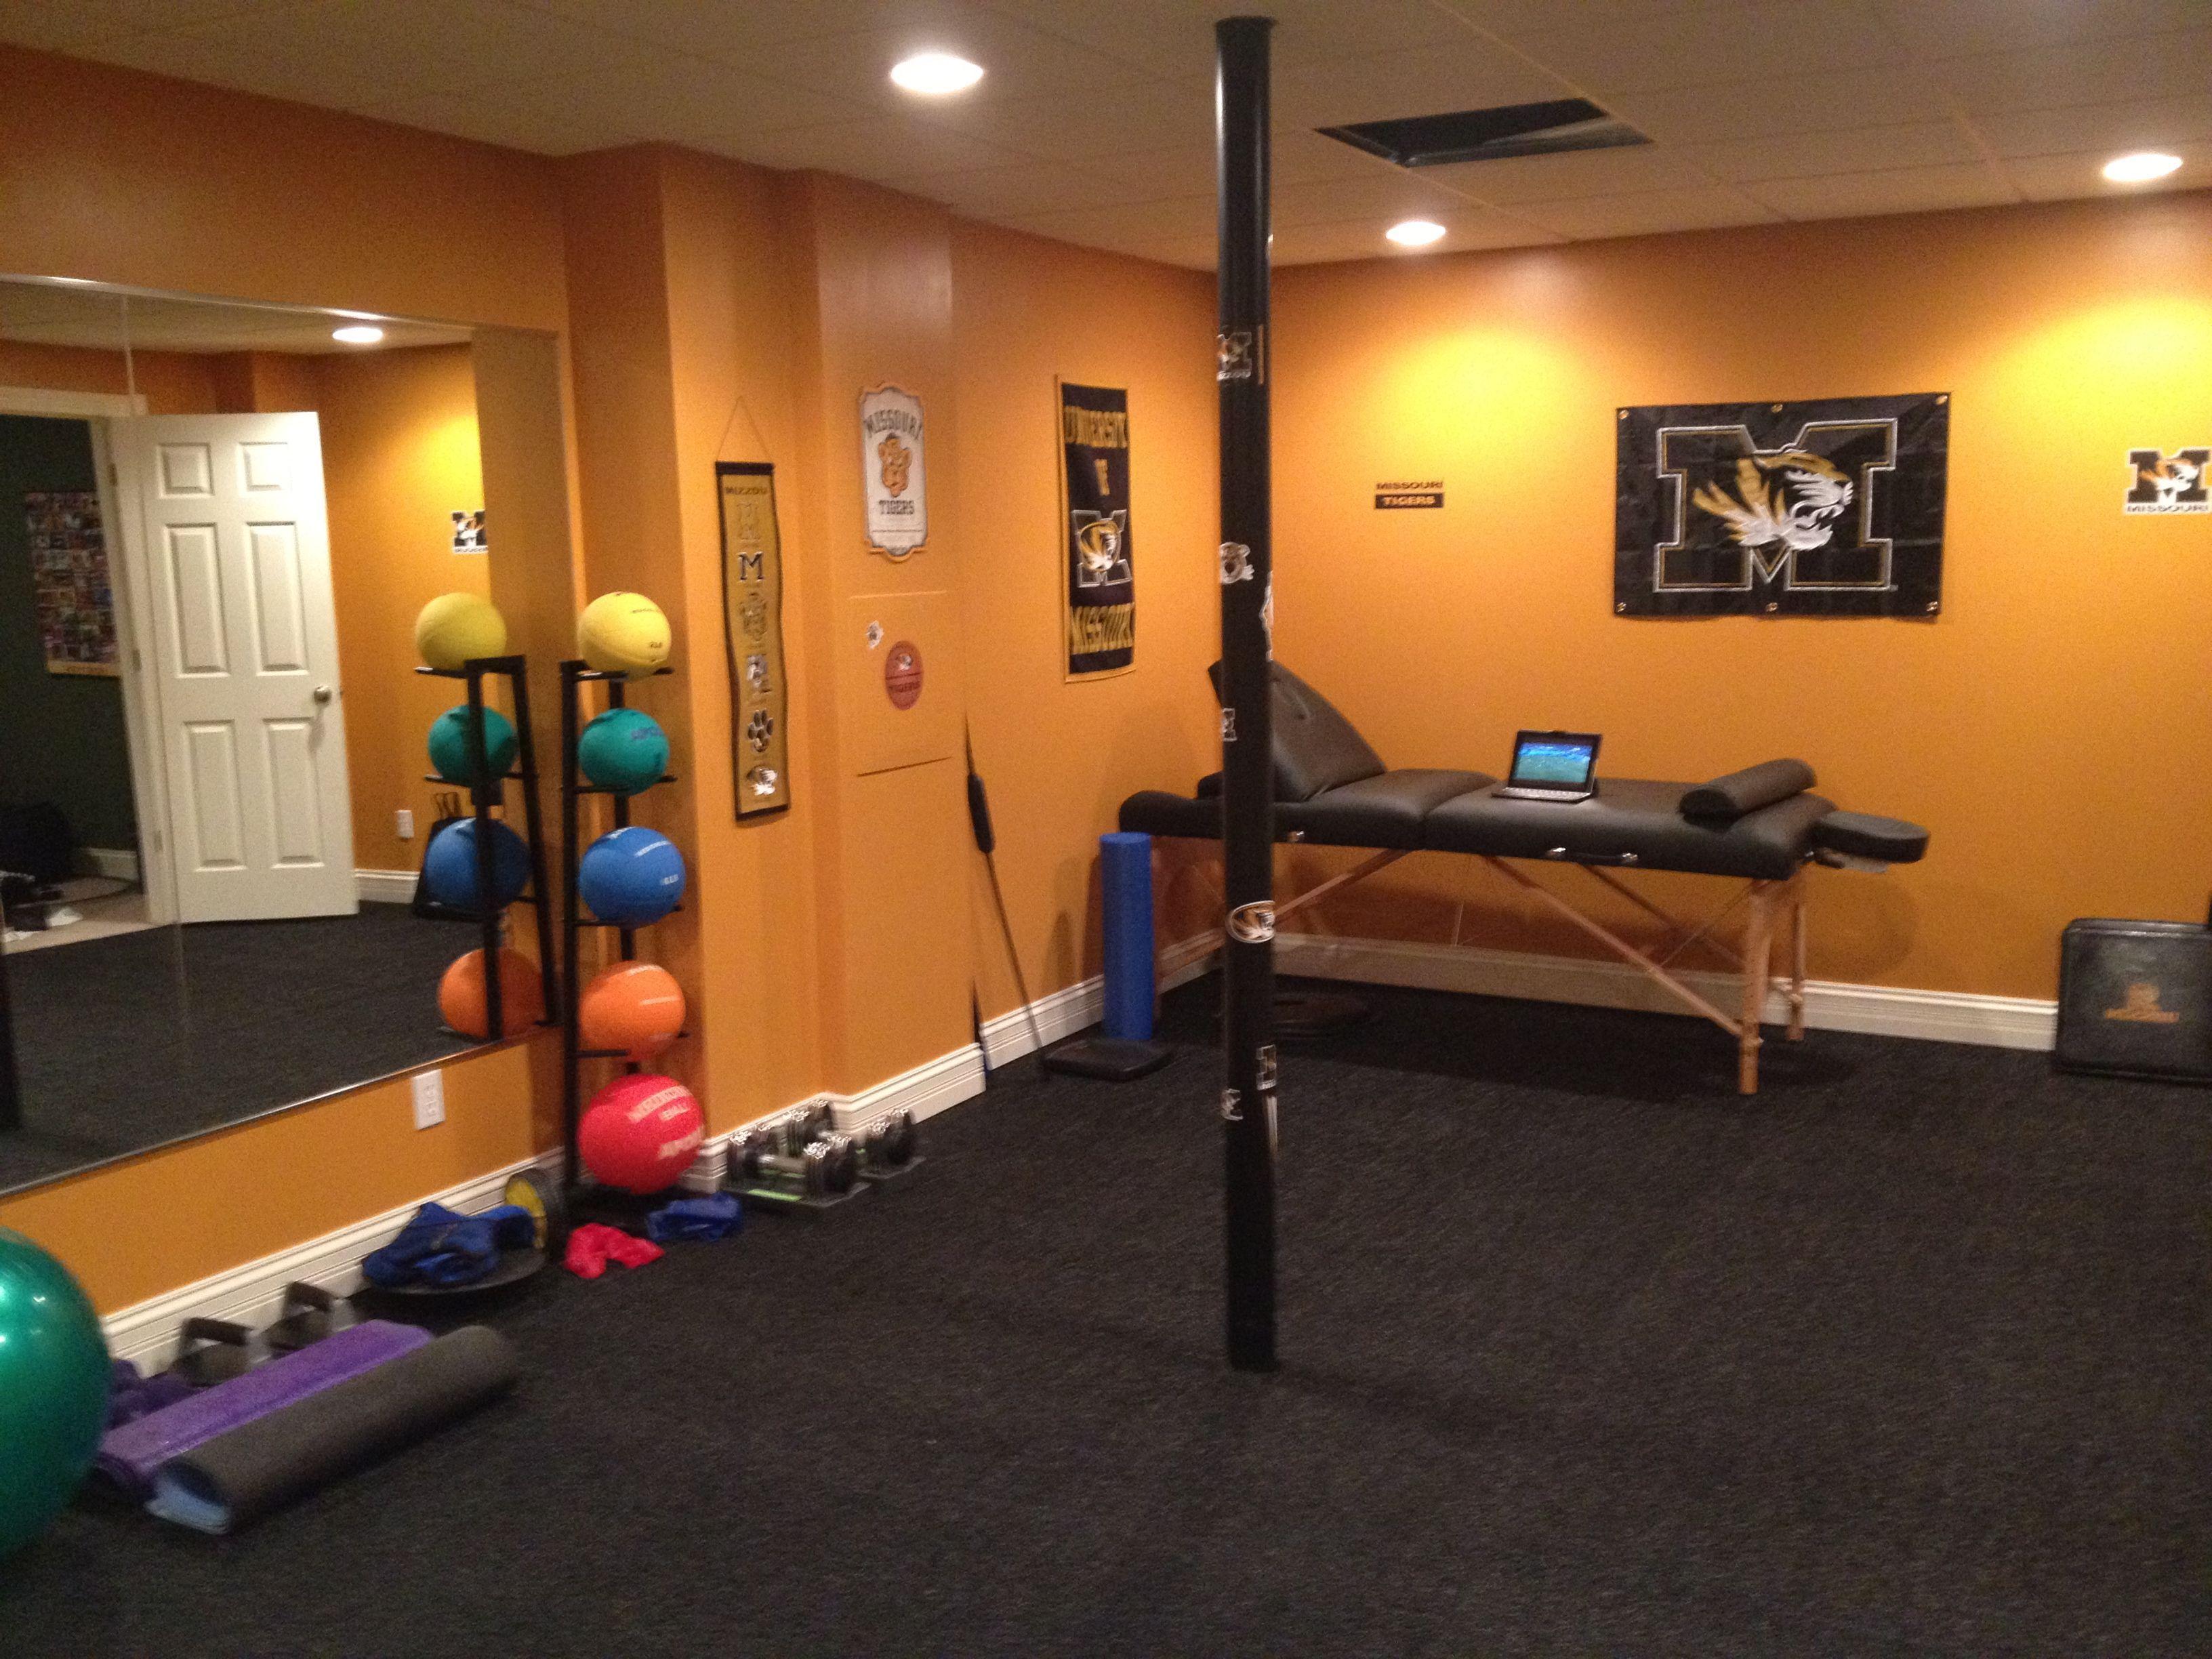 Home gym flooring weight room flooring yoga flooring workout